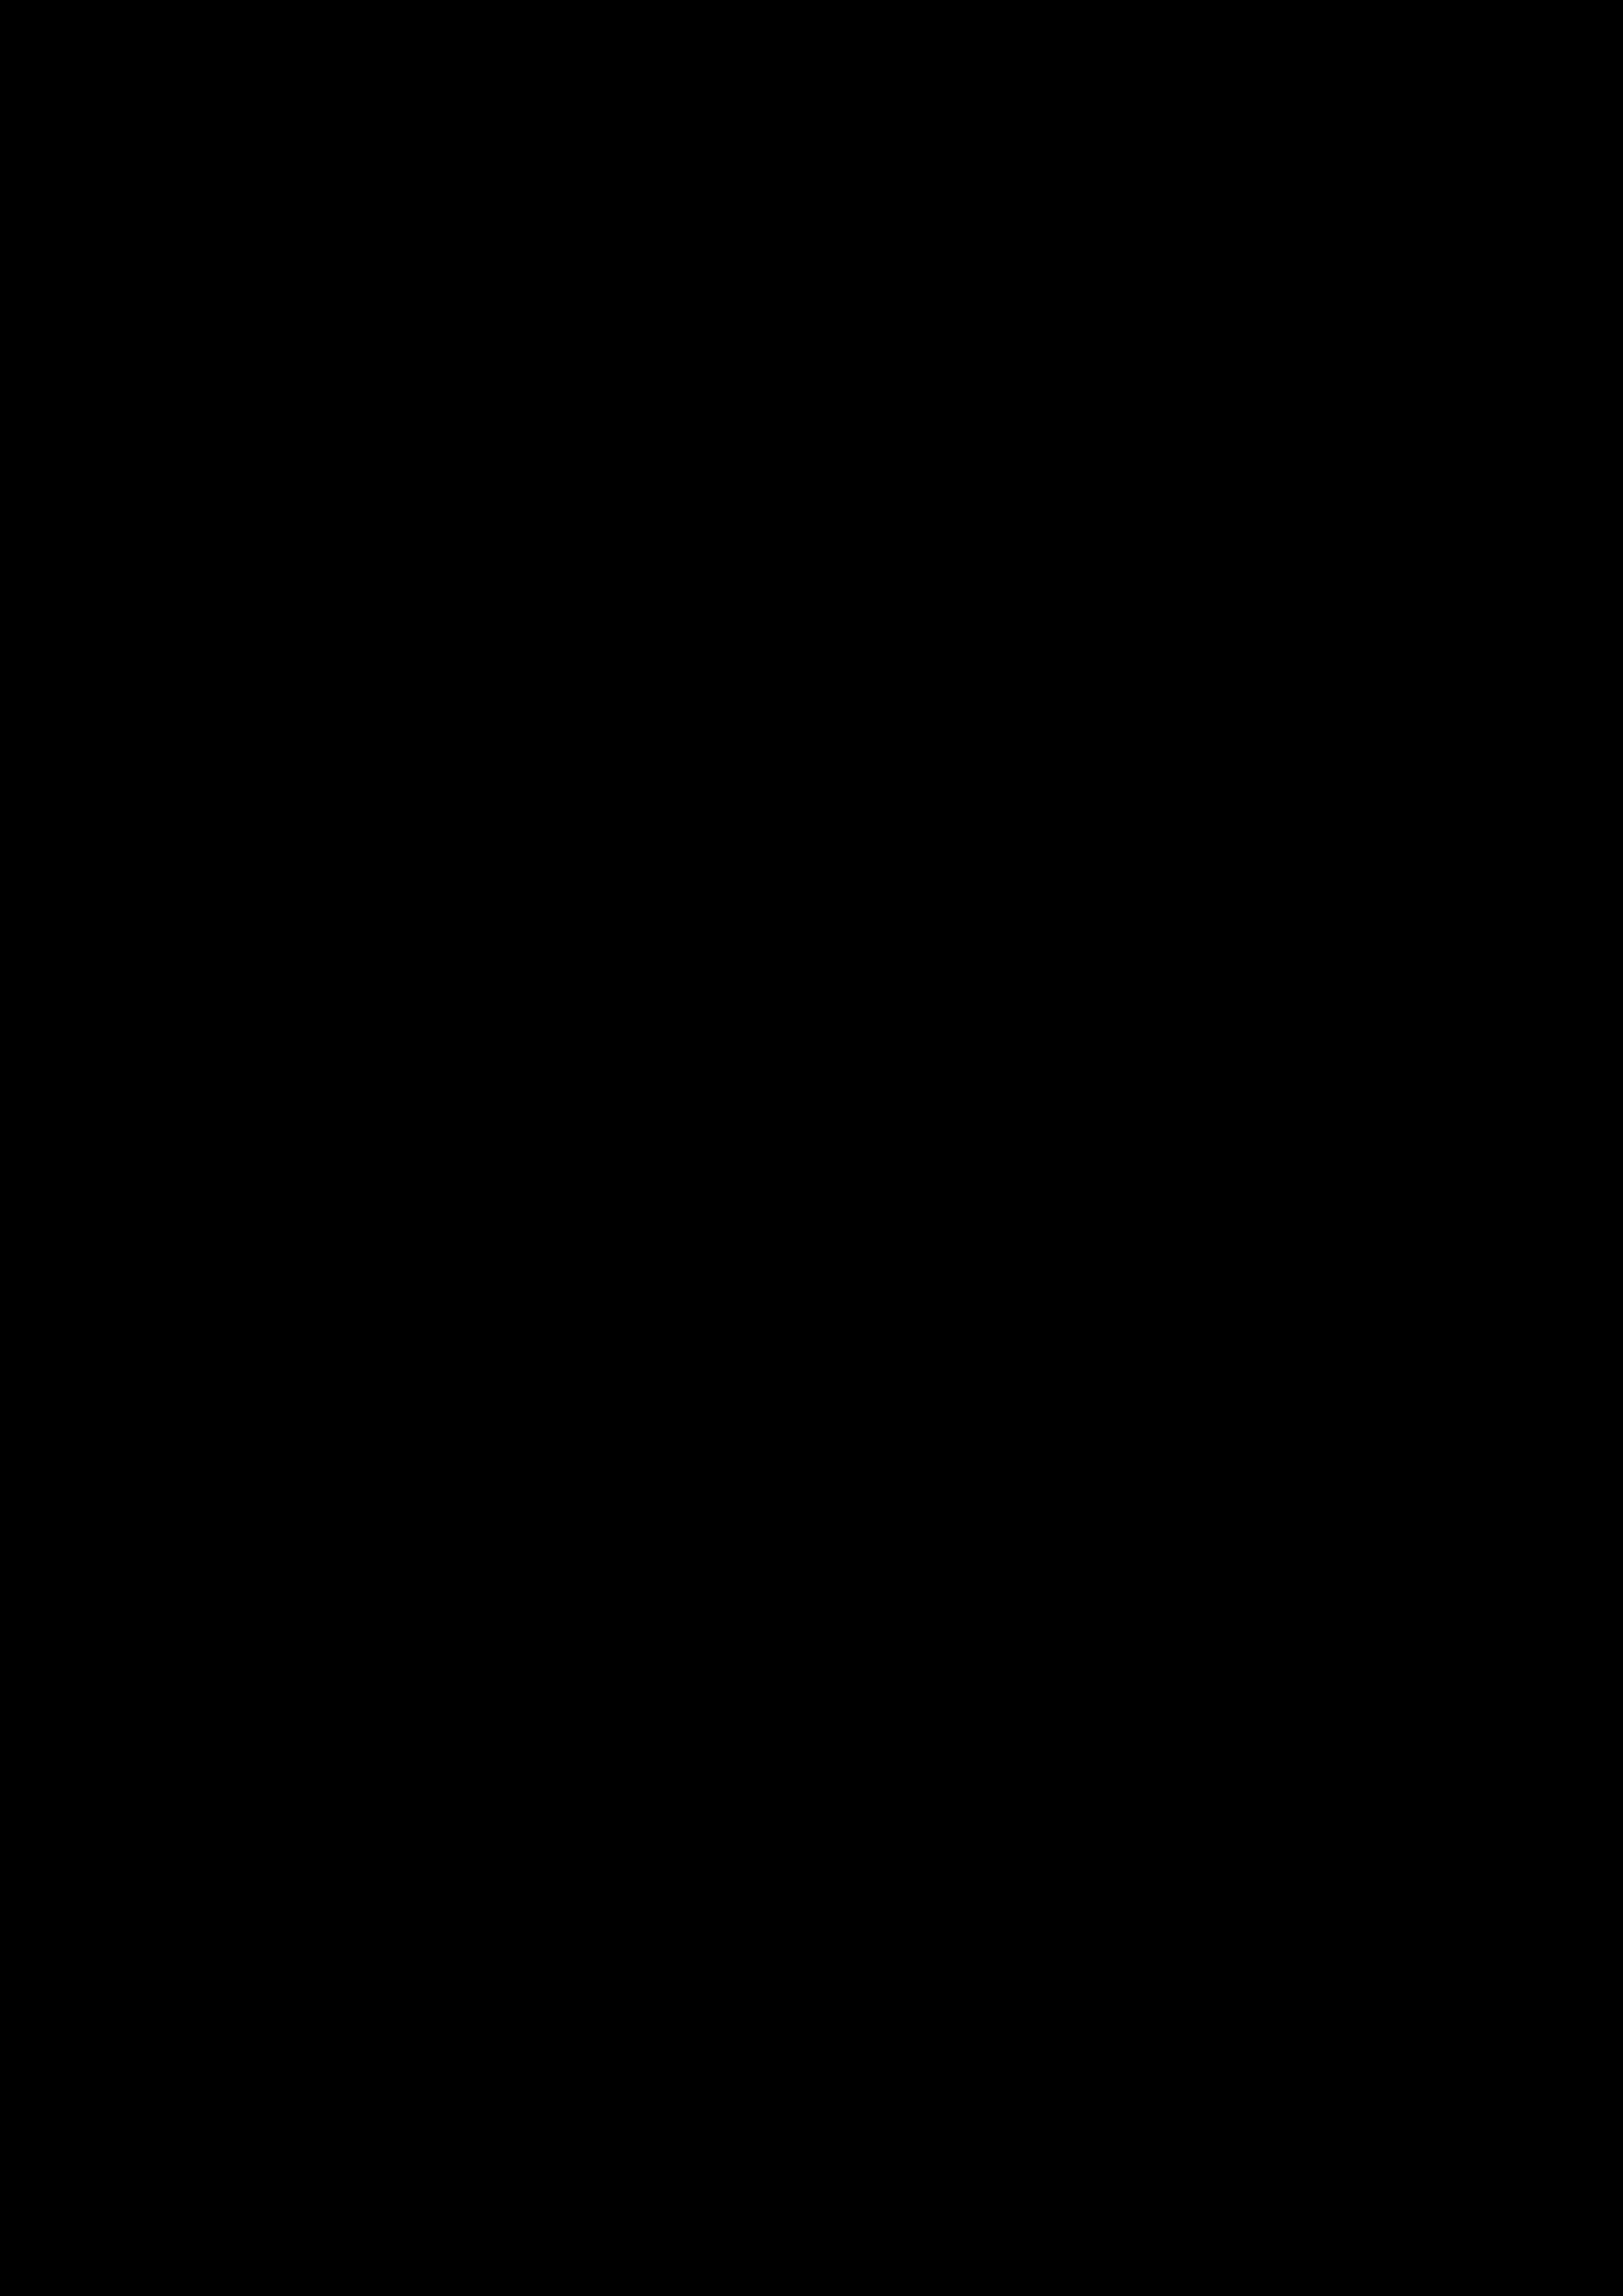 Baseball clipart black and white vector vector transparent Diamond Clipart Black And White | Free download best Diamond Clipart ... vector transparent